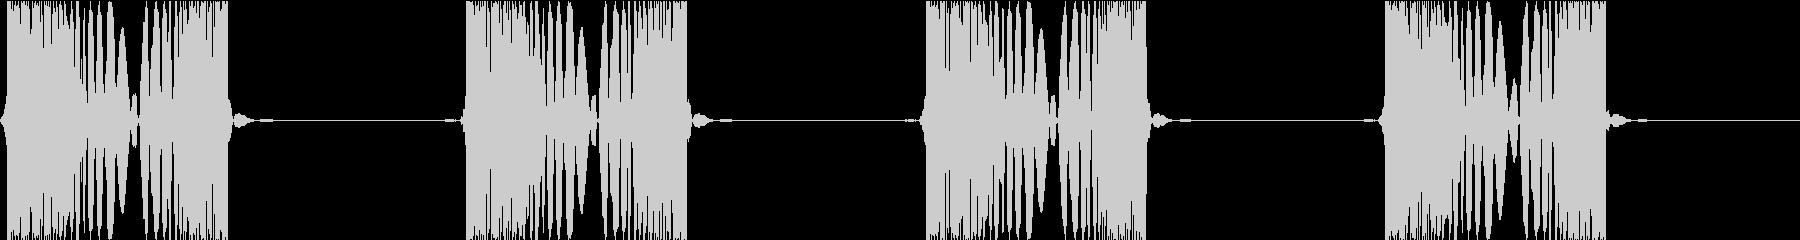 DJプレイ スクラッチ・ノイズ 100の未再生の波形